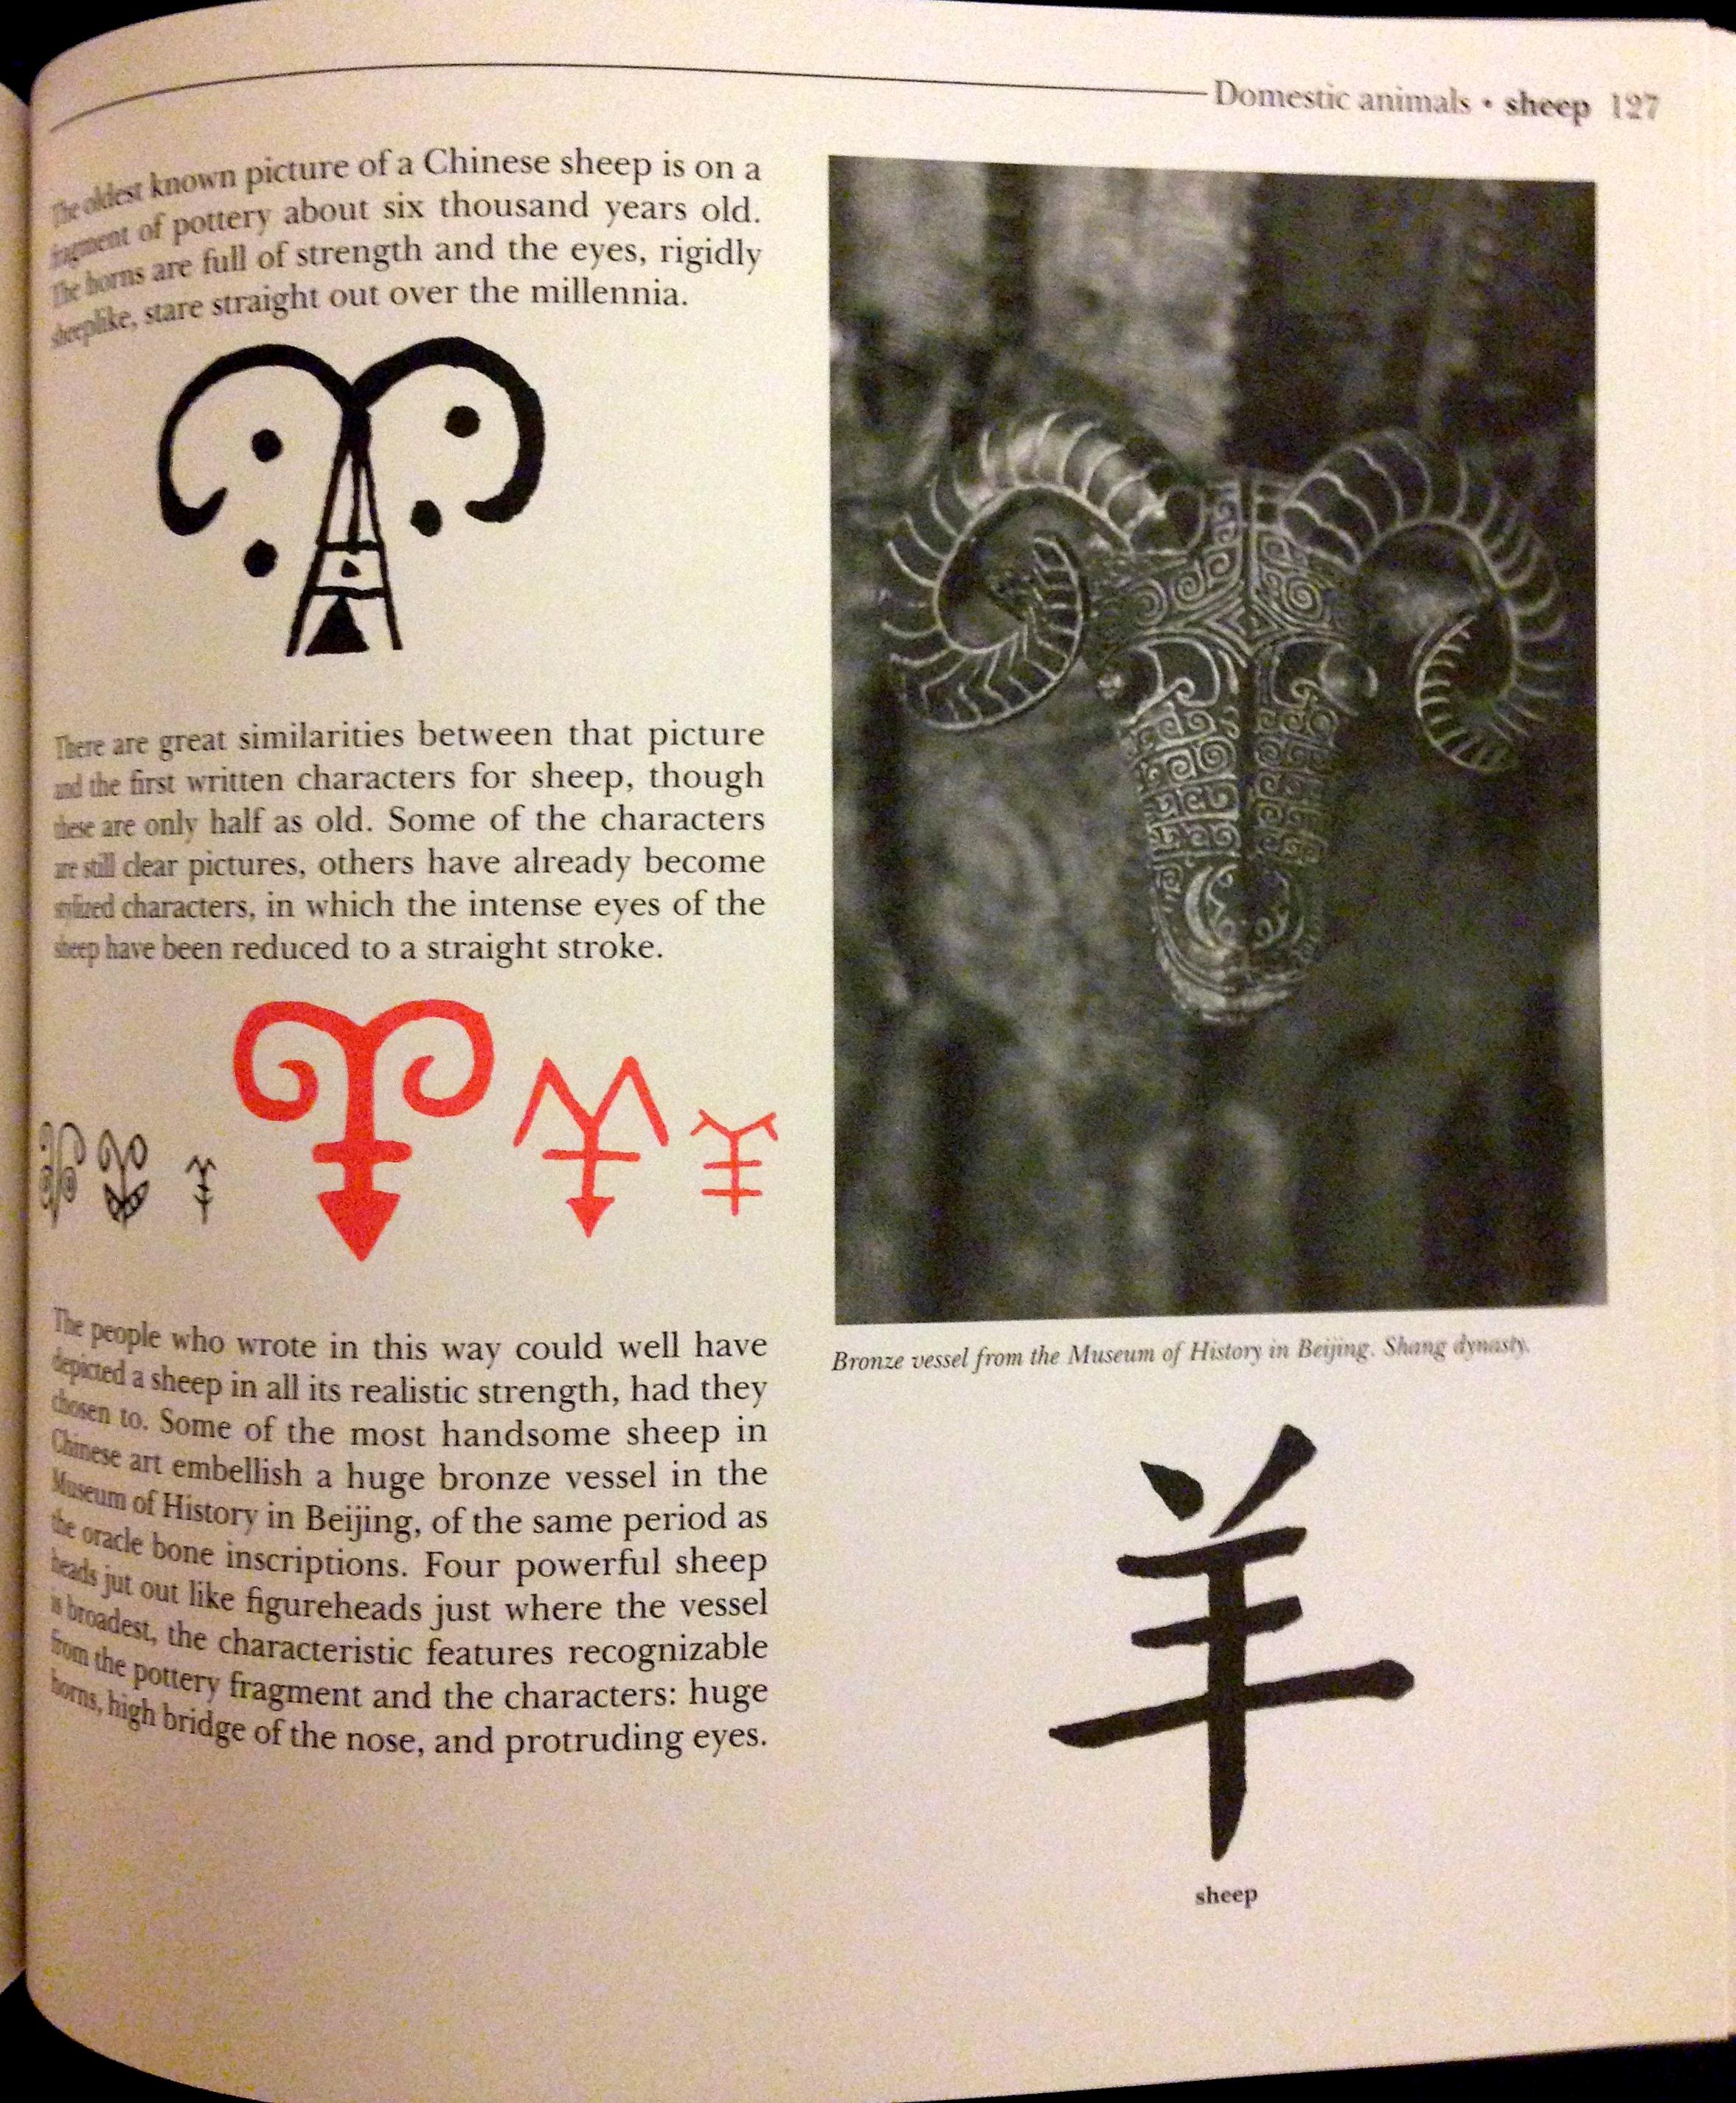 empire of living symbols book review language boat man mankind empire of living symbols sample page 2